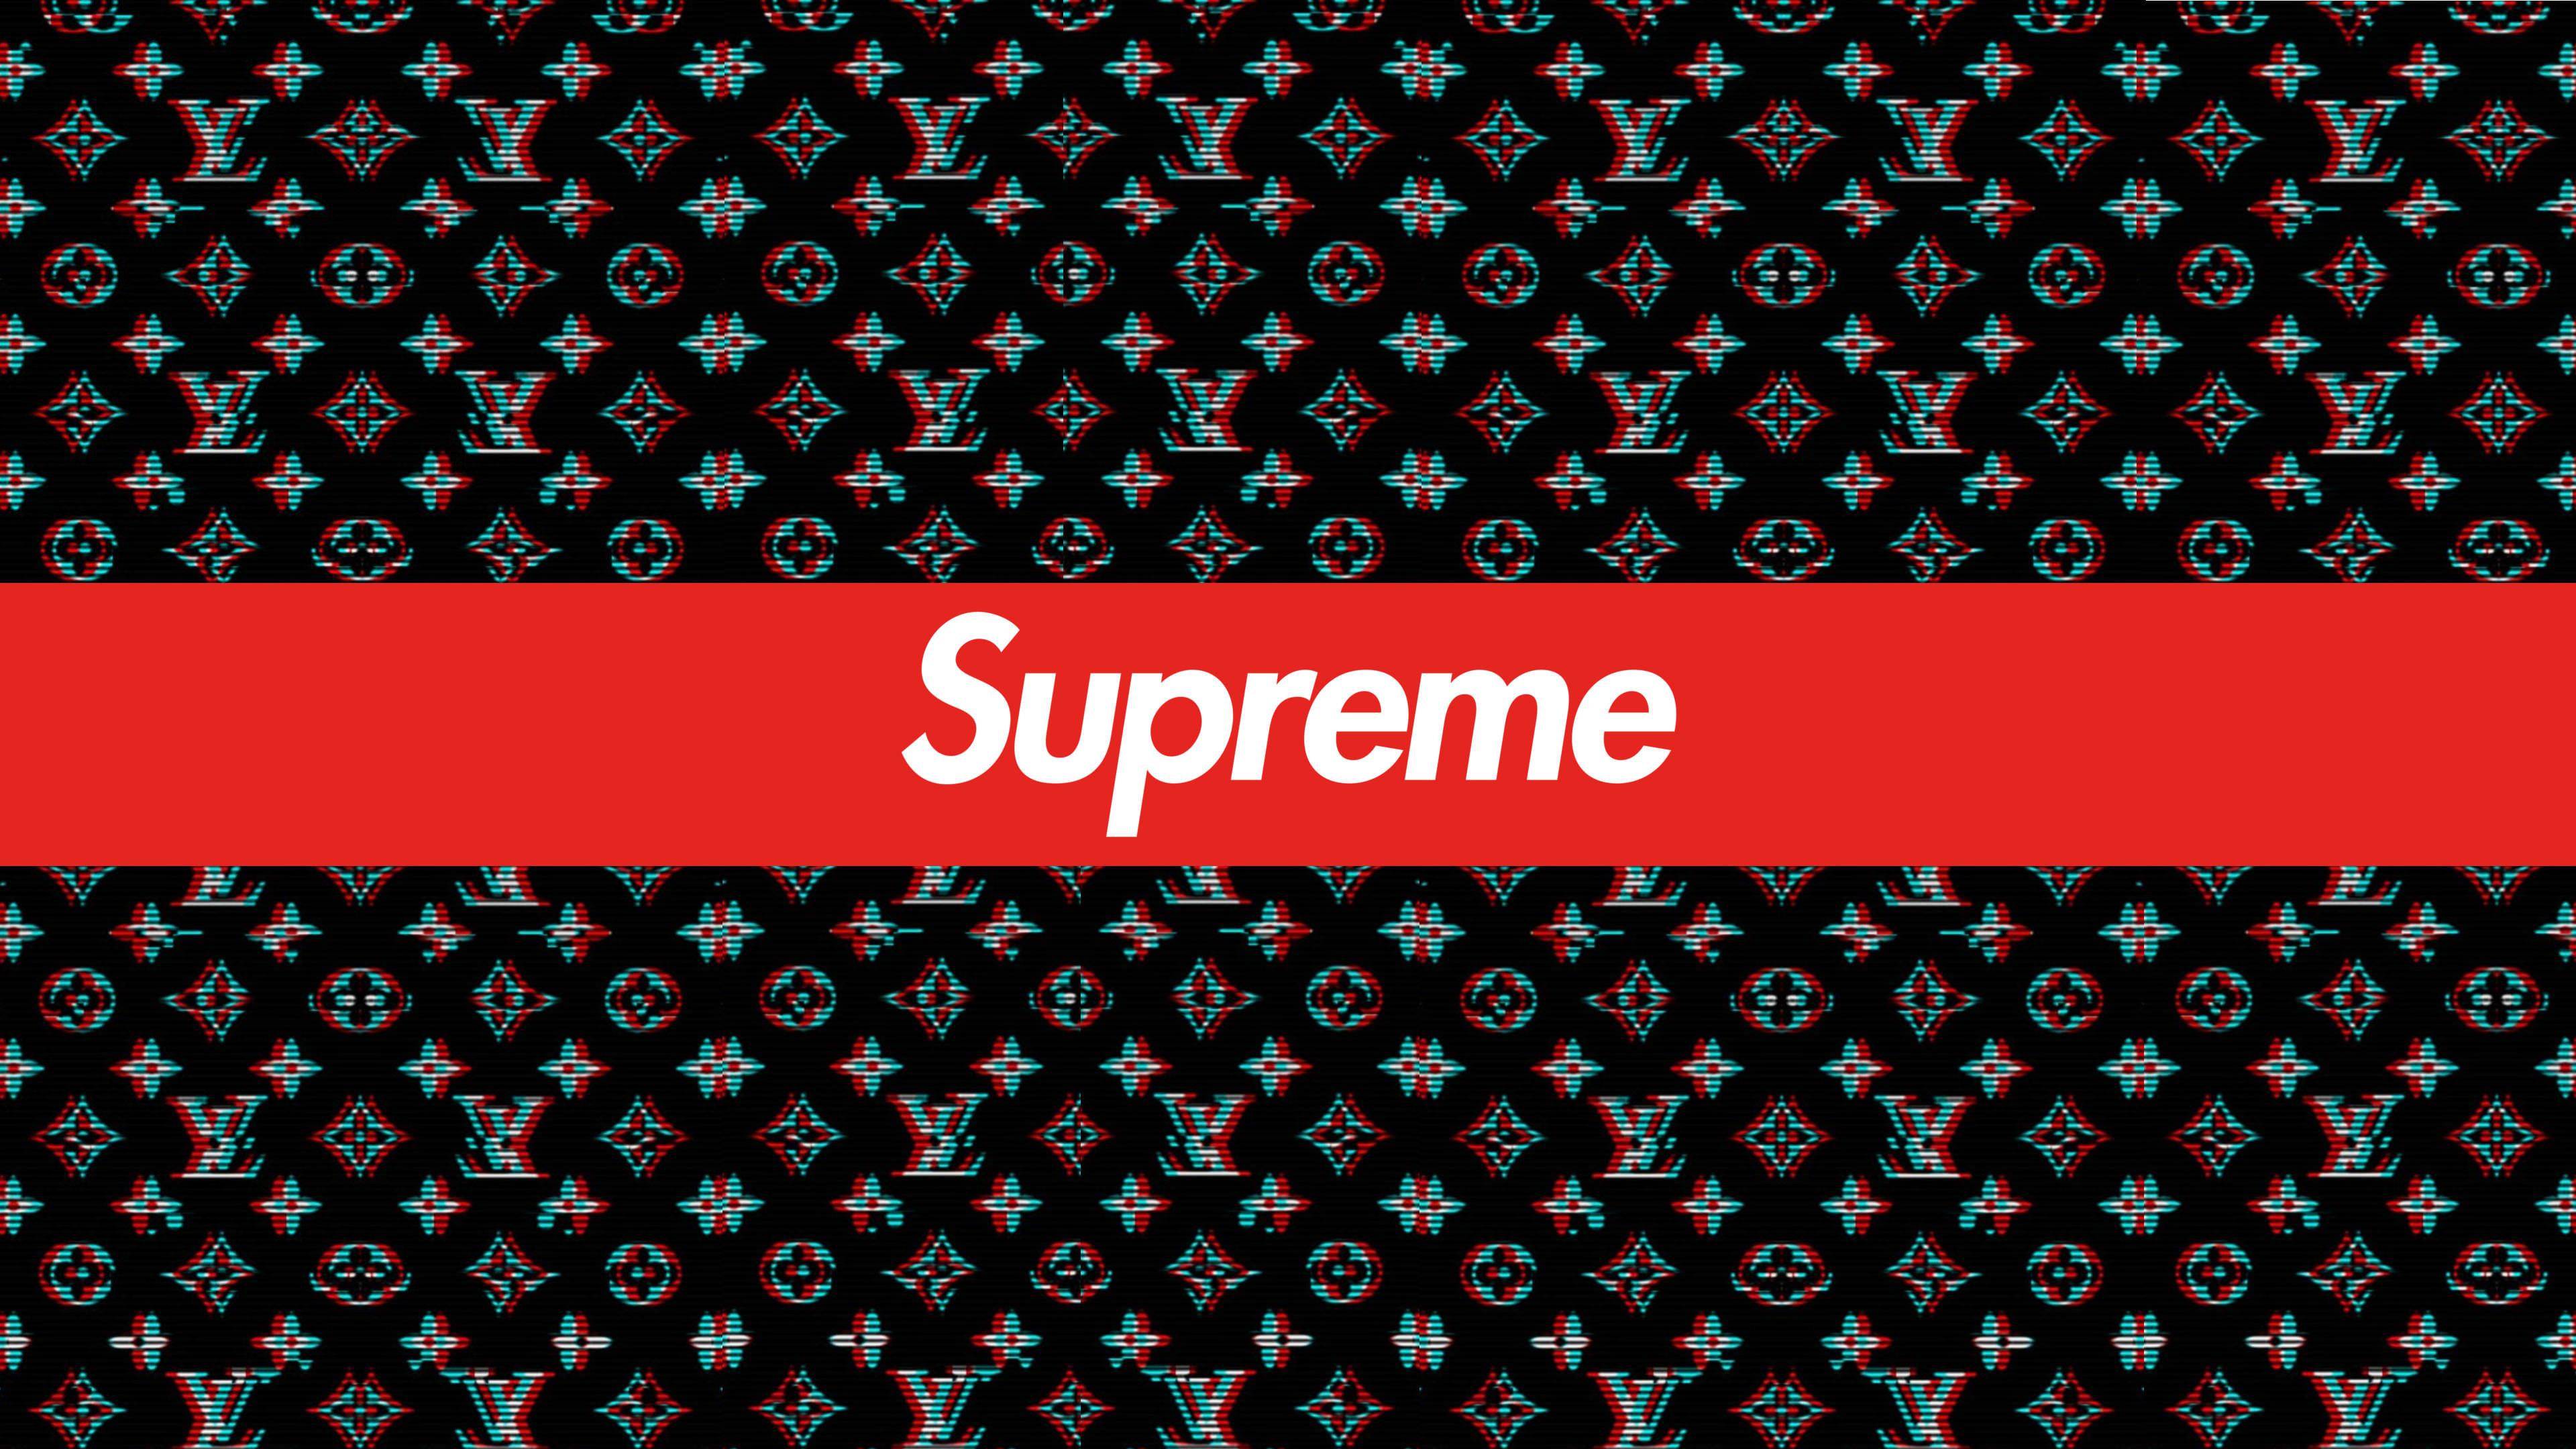 Supreme Laptop Wallpapers Wallpaper Cave